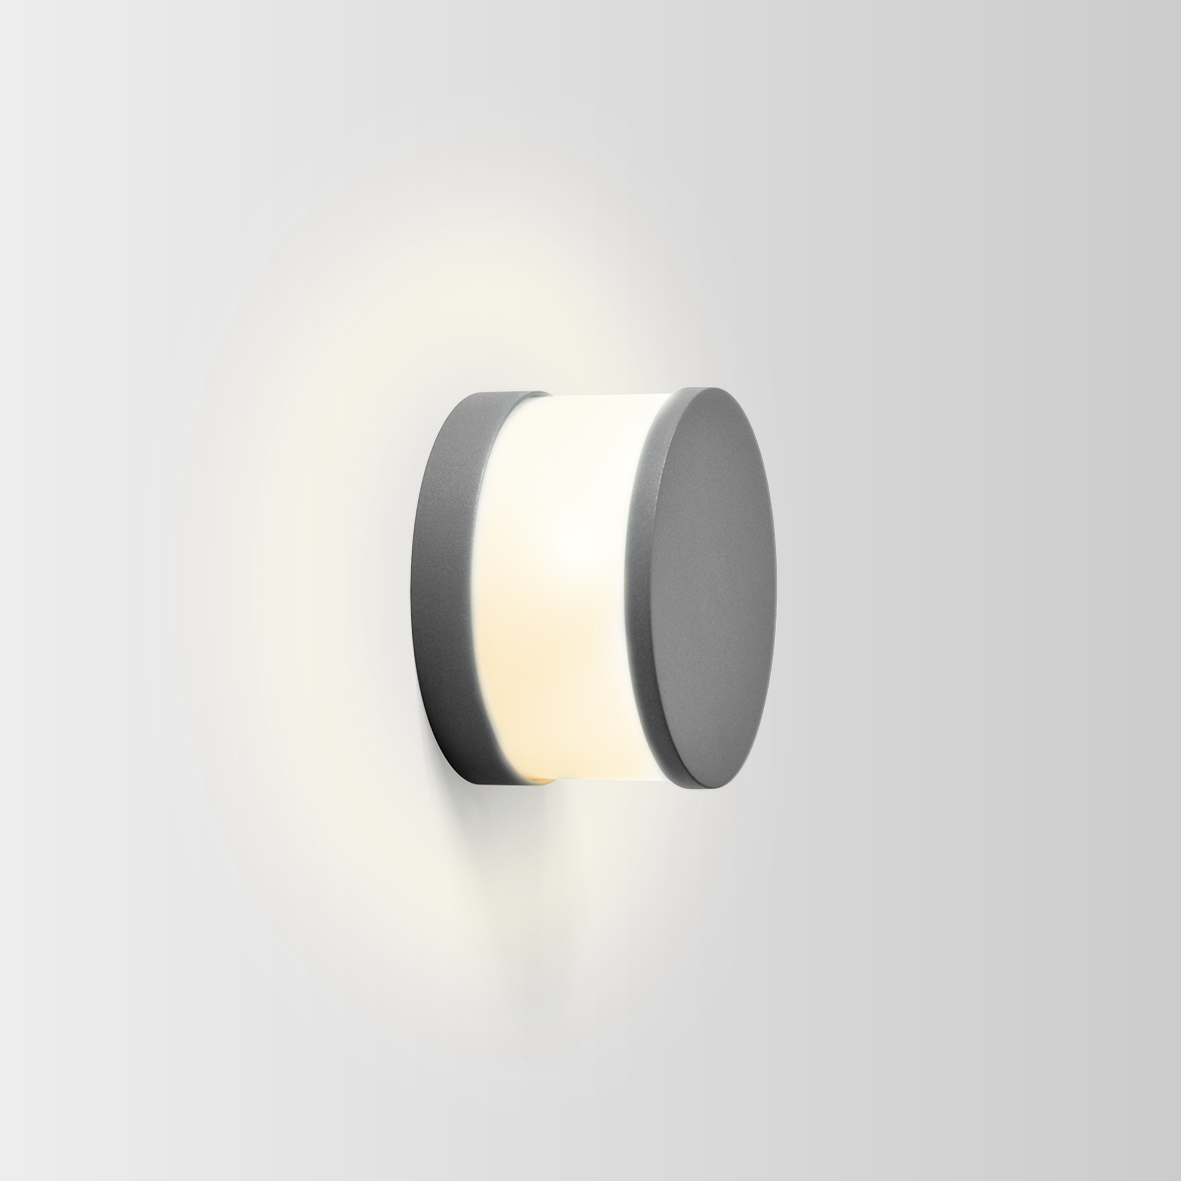 GETTON 1.0 LED 3000K DIM TUMEHALL 8W 85CRI 220-240VAC, välisvalgusti seinale